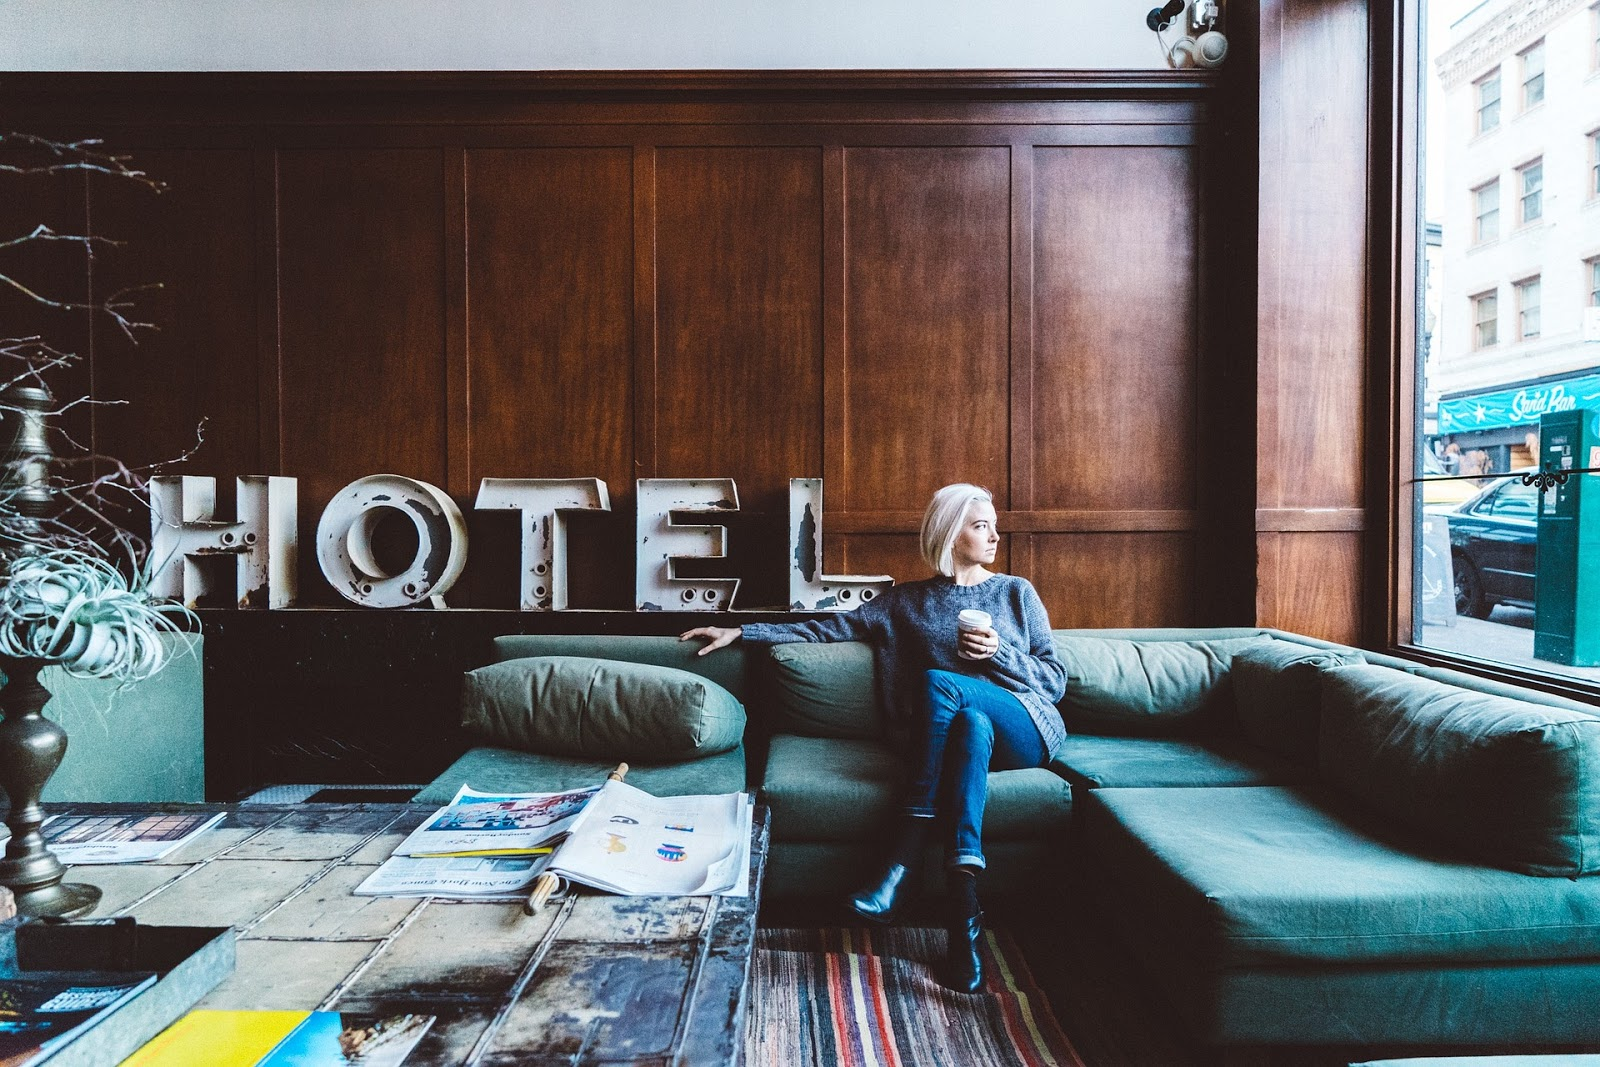 Comparar hotel